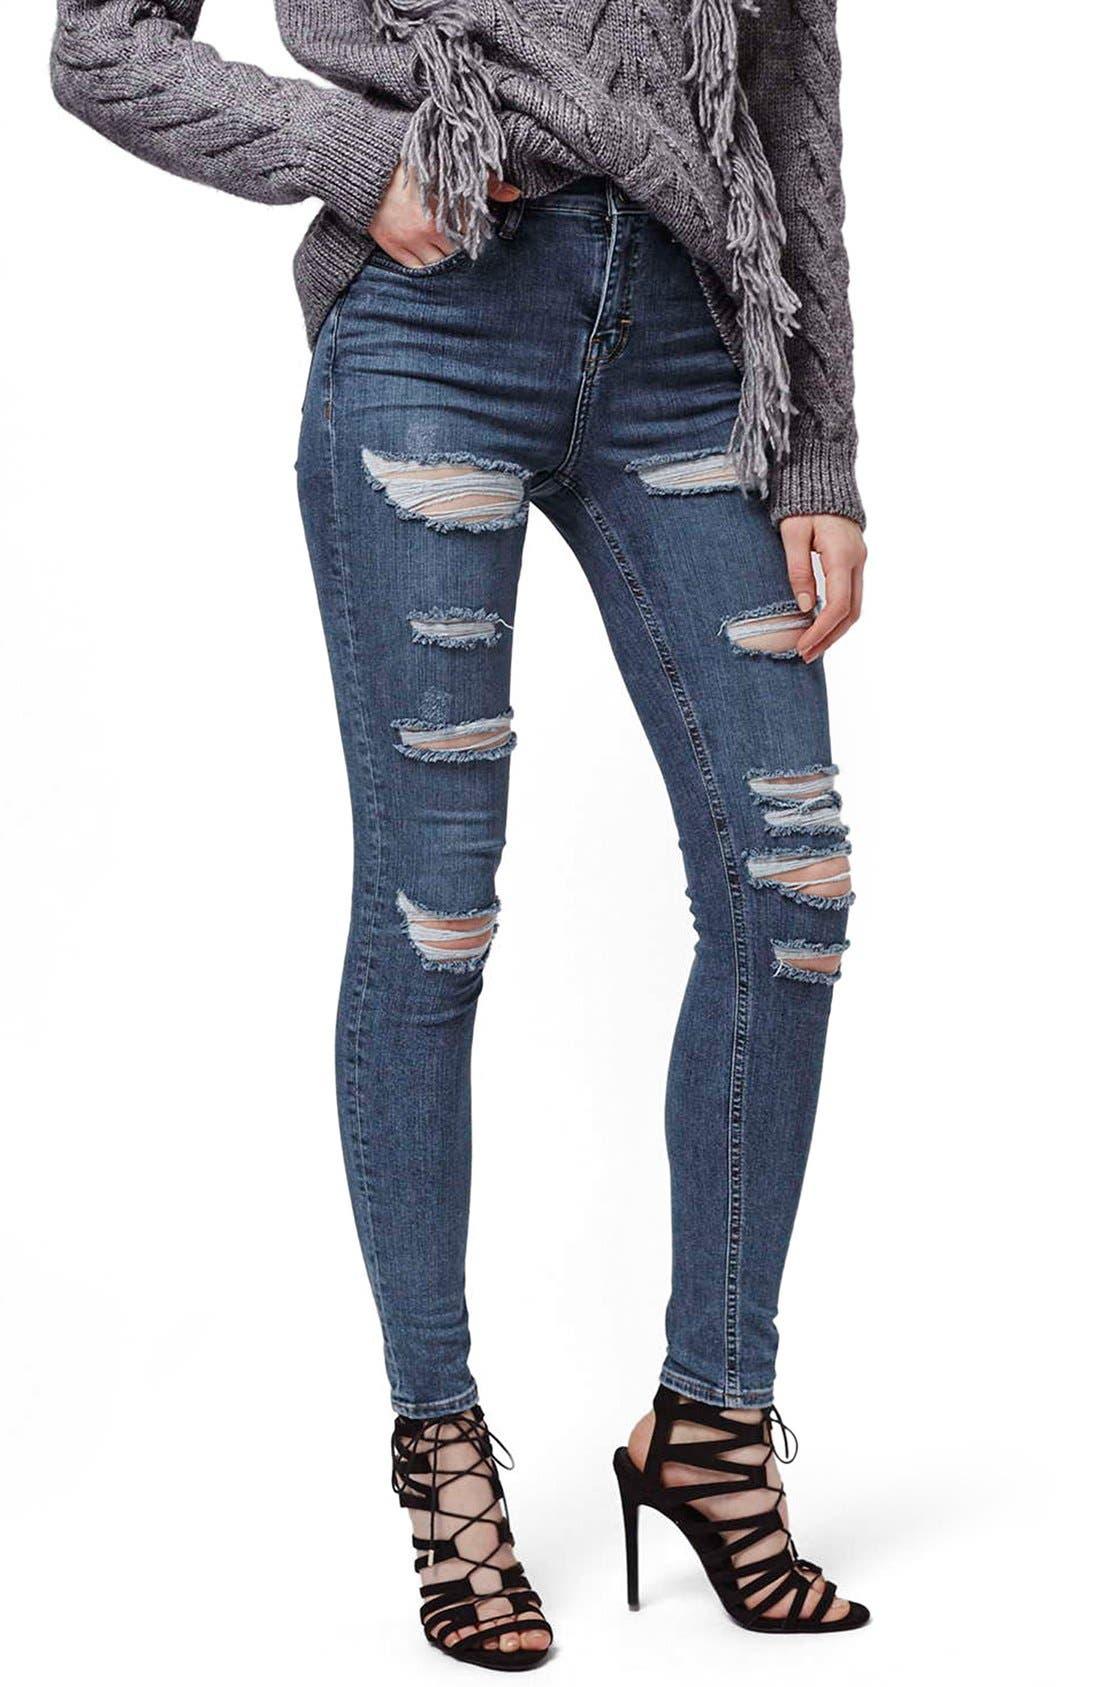 Alternate Image 1 Selected - Topshop Moto 'Jamie' Shredded Skinny Jeans